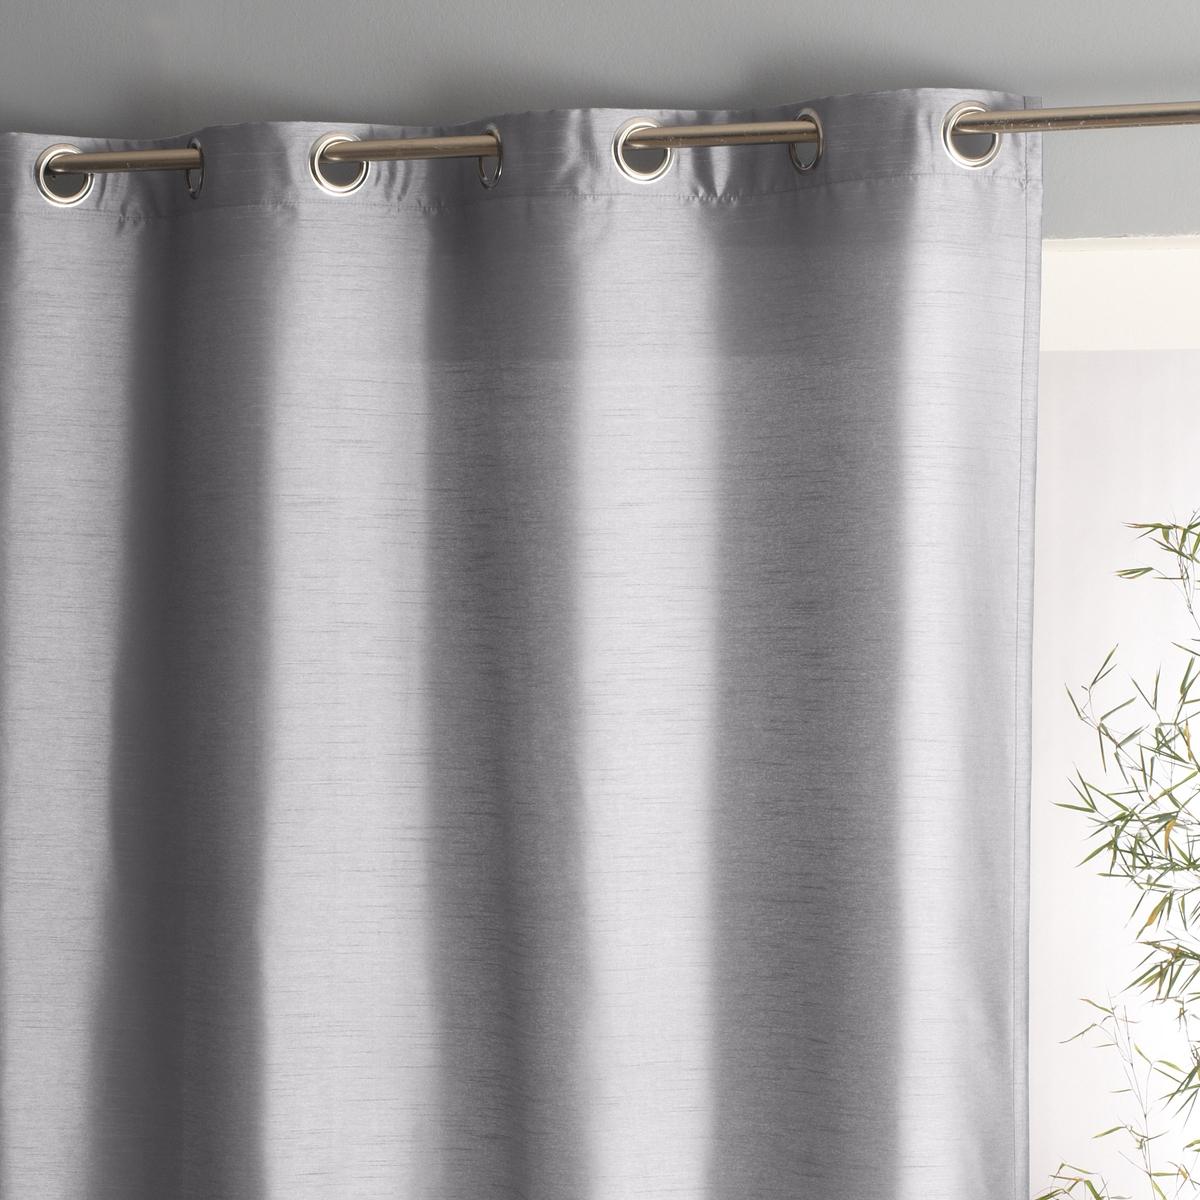 Штора La Redoute С эффектом шелковой ткани NYERI 180 x 140 см серый ремень с эффектом ткани с заклепками